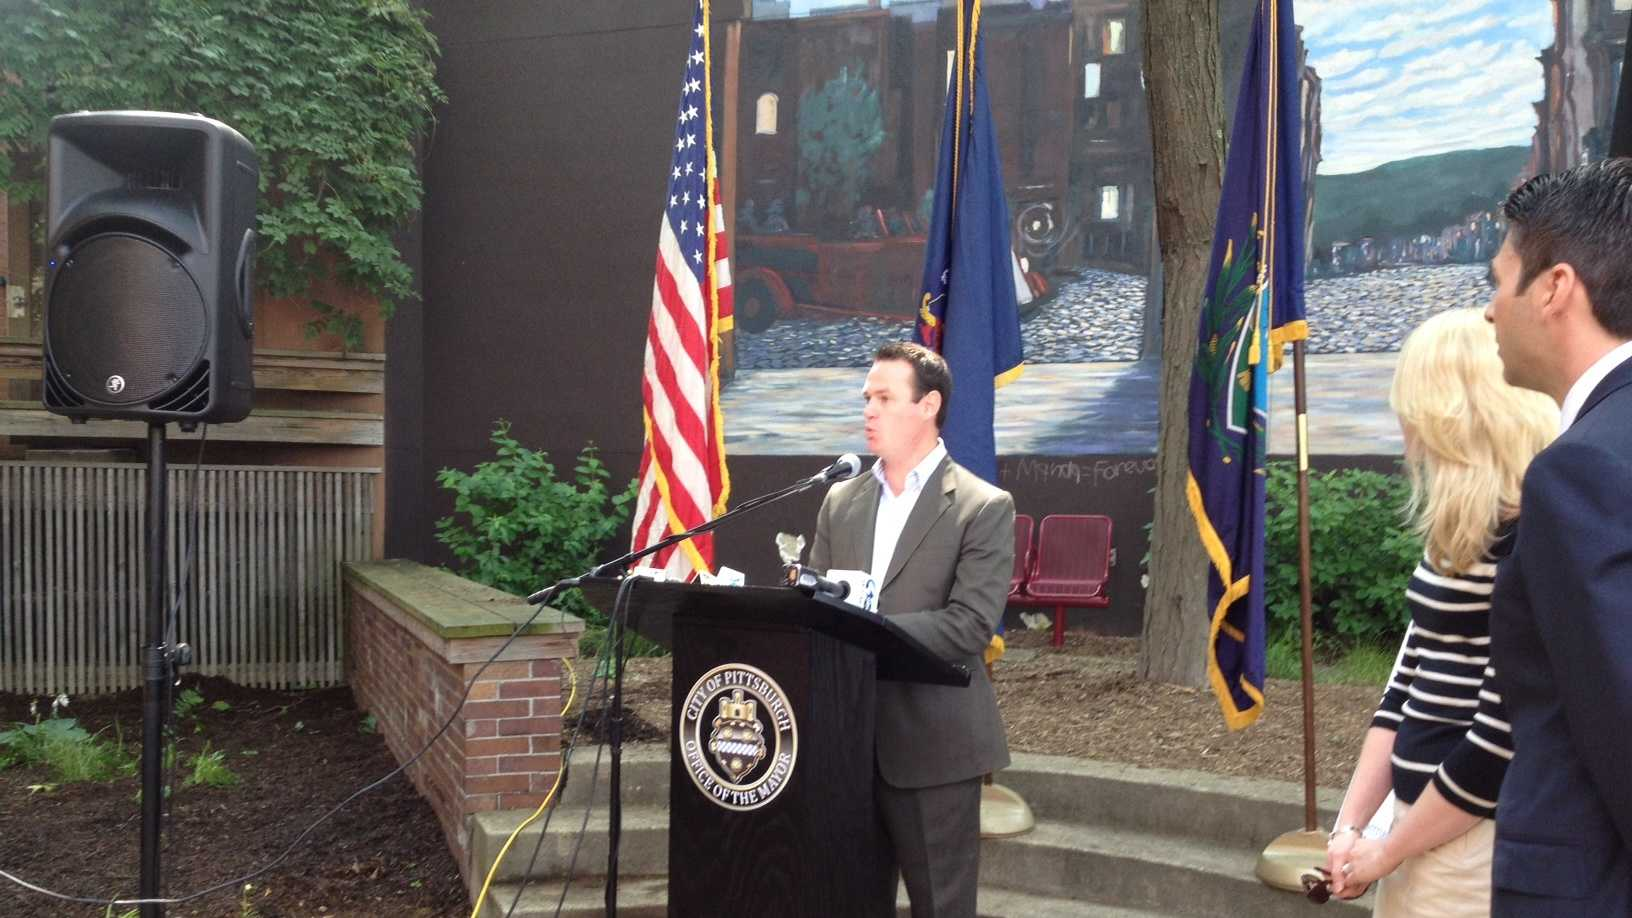 Mayor Luke Ravenstahl